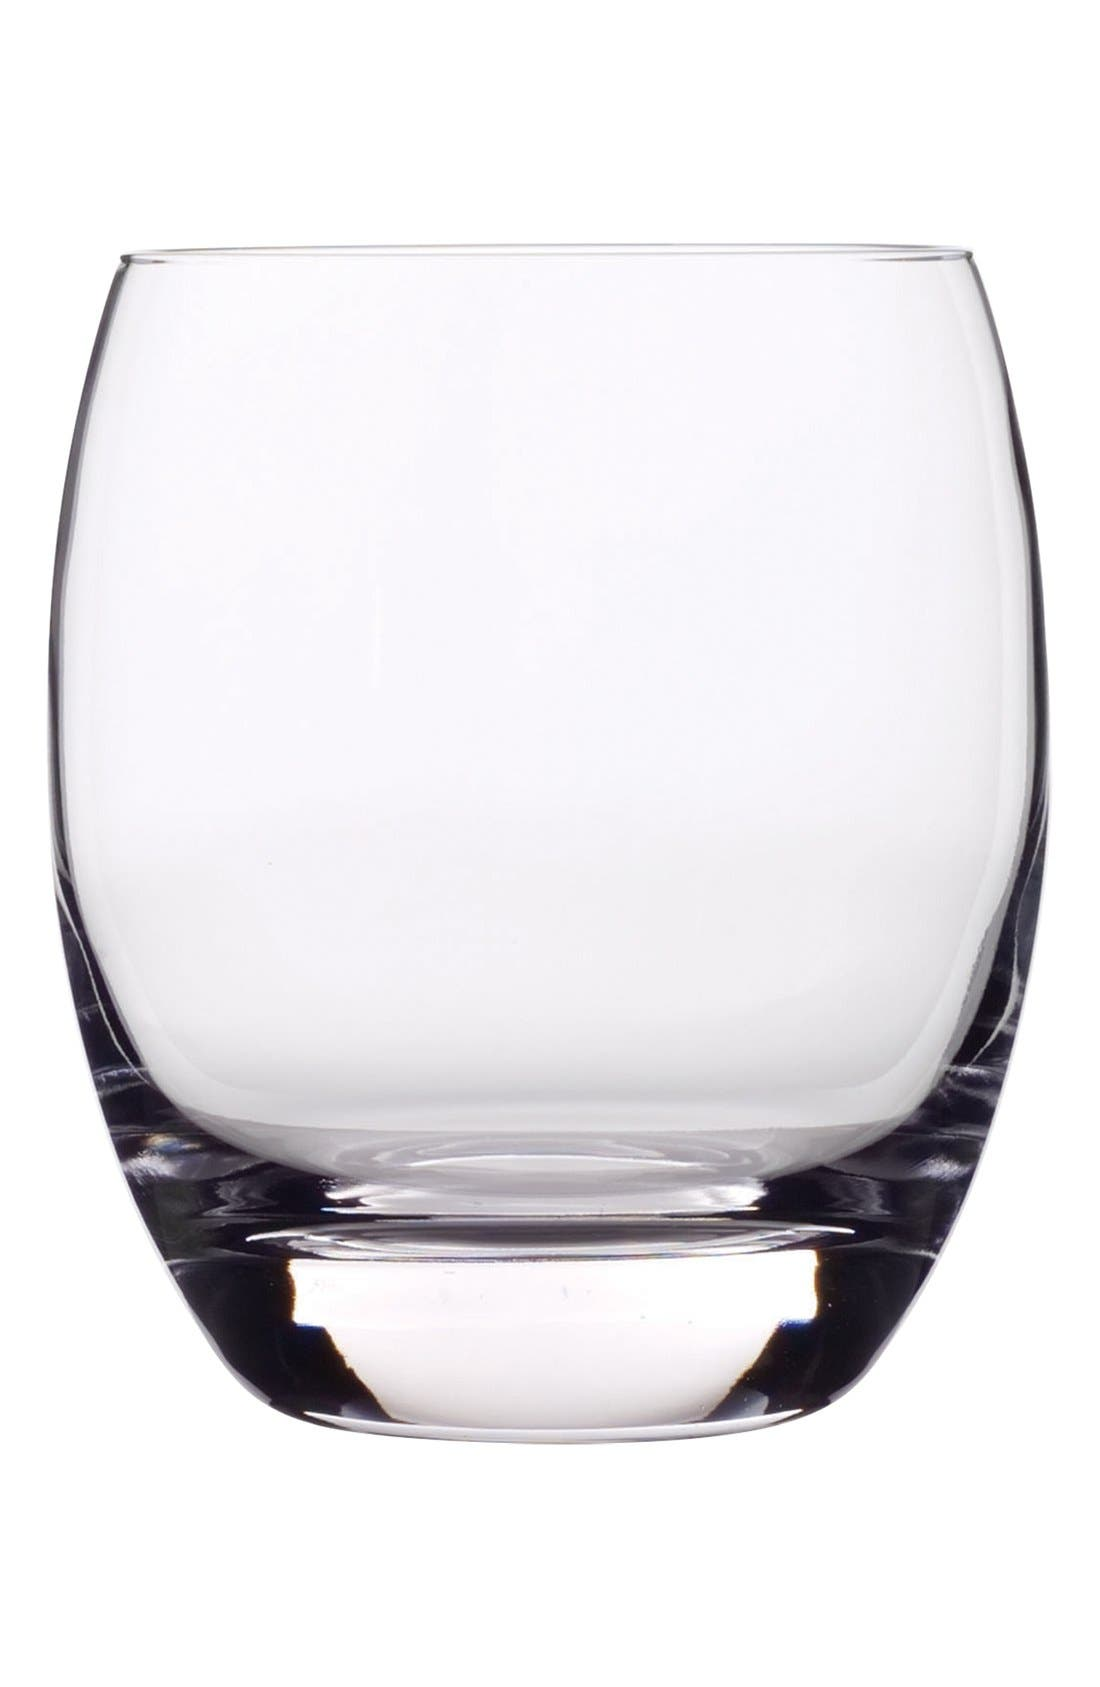 Alternate Image 1 Selected - Luigi Bormioli 'Crescendo' Double Old Fashioned Glasses (Set of 4)